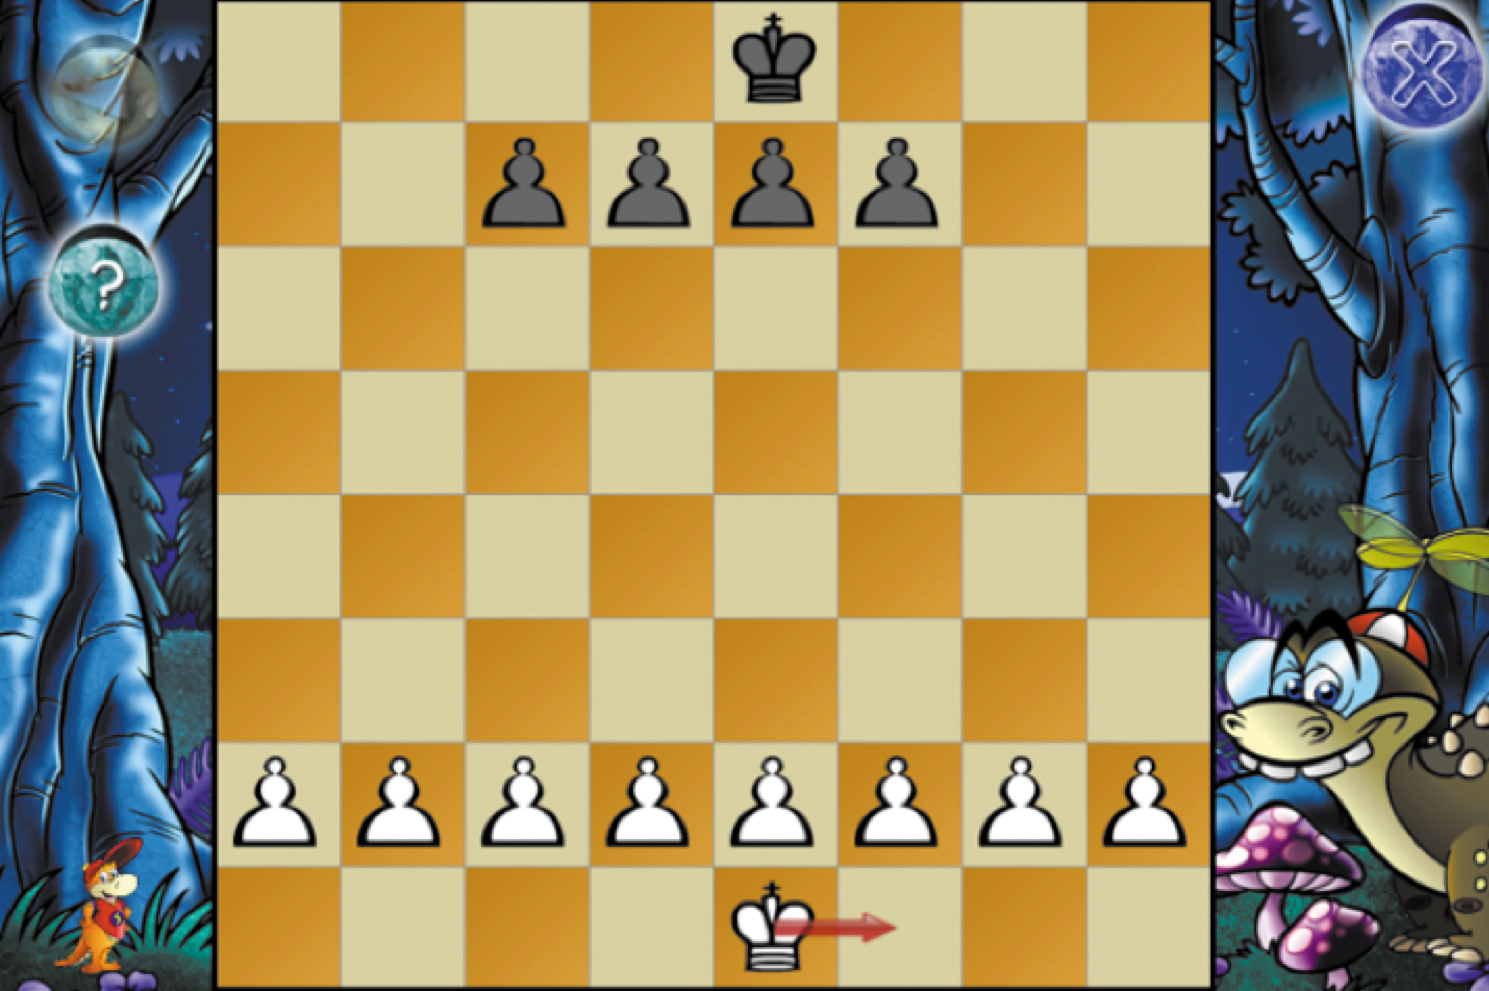 Screenshot of a chess game showing contextual help arrows